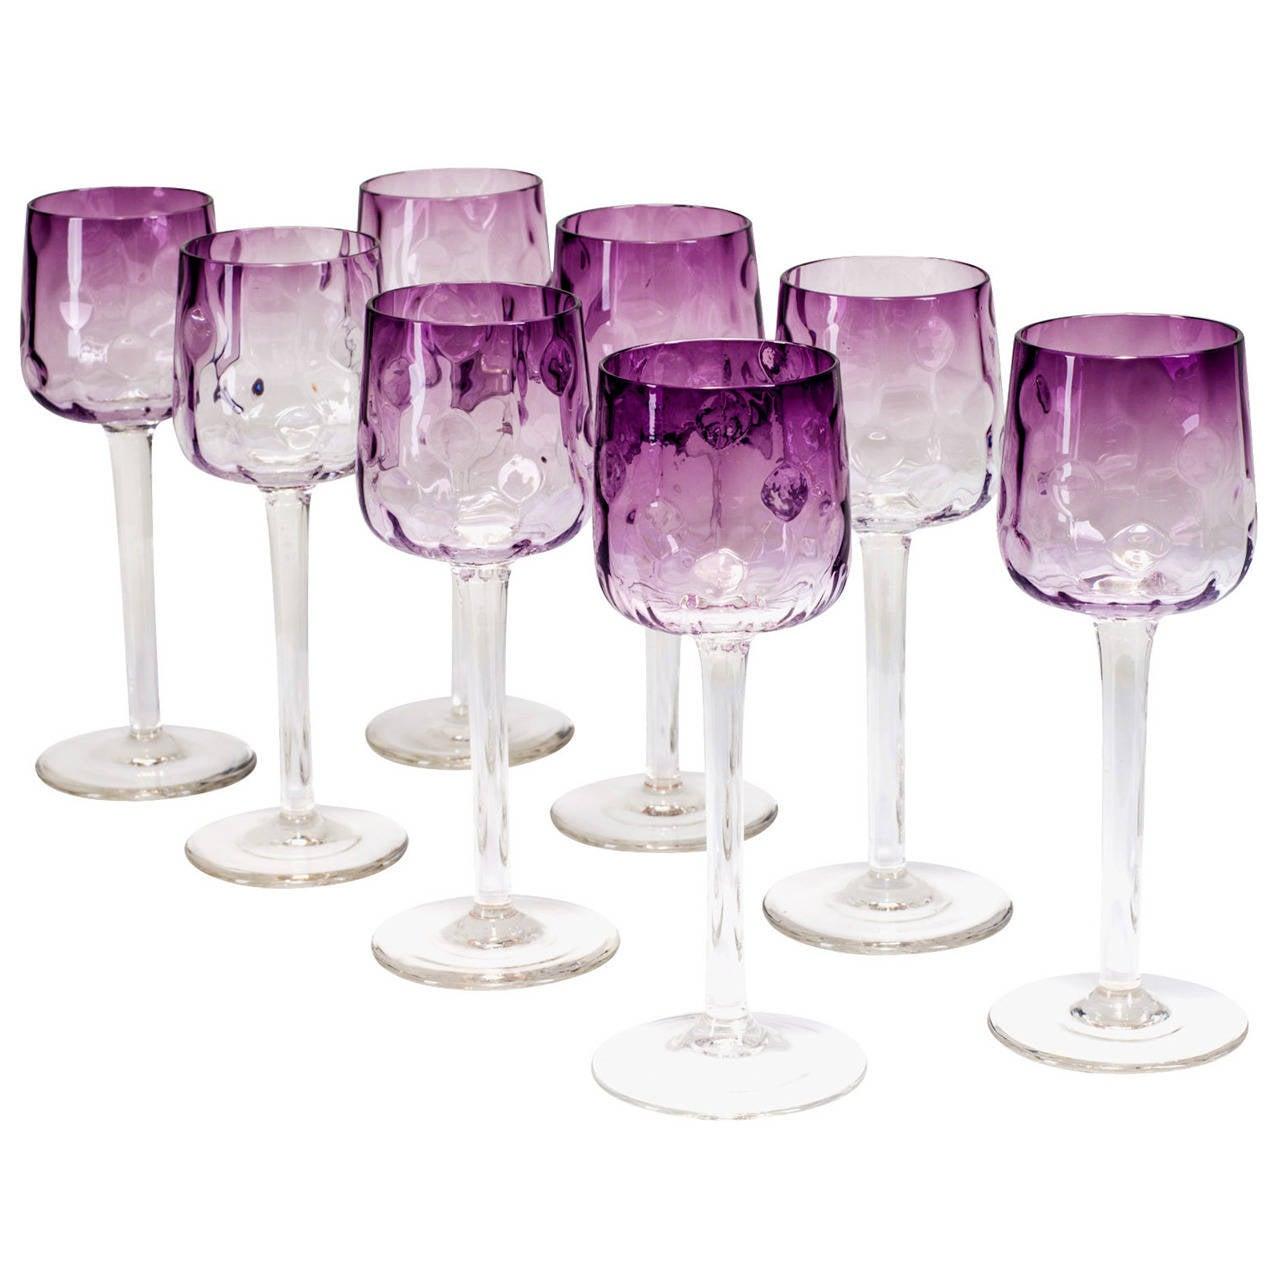 "Koloman Moser Nine wine glasses ""Meteor"" ca. 1900 For Sale"